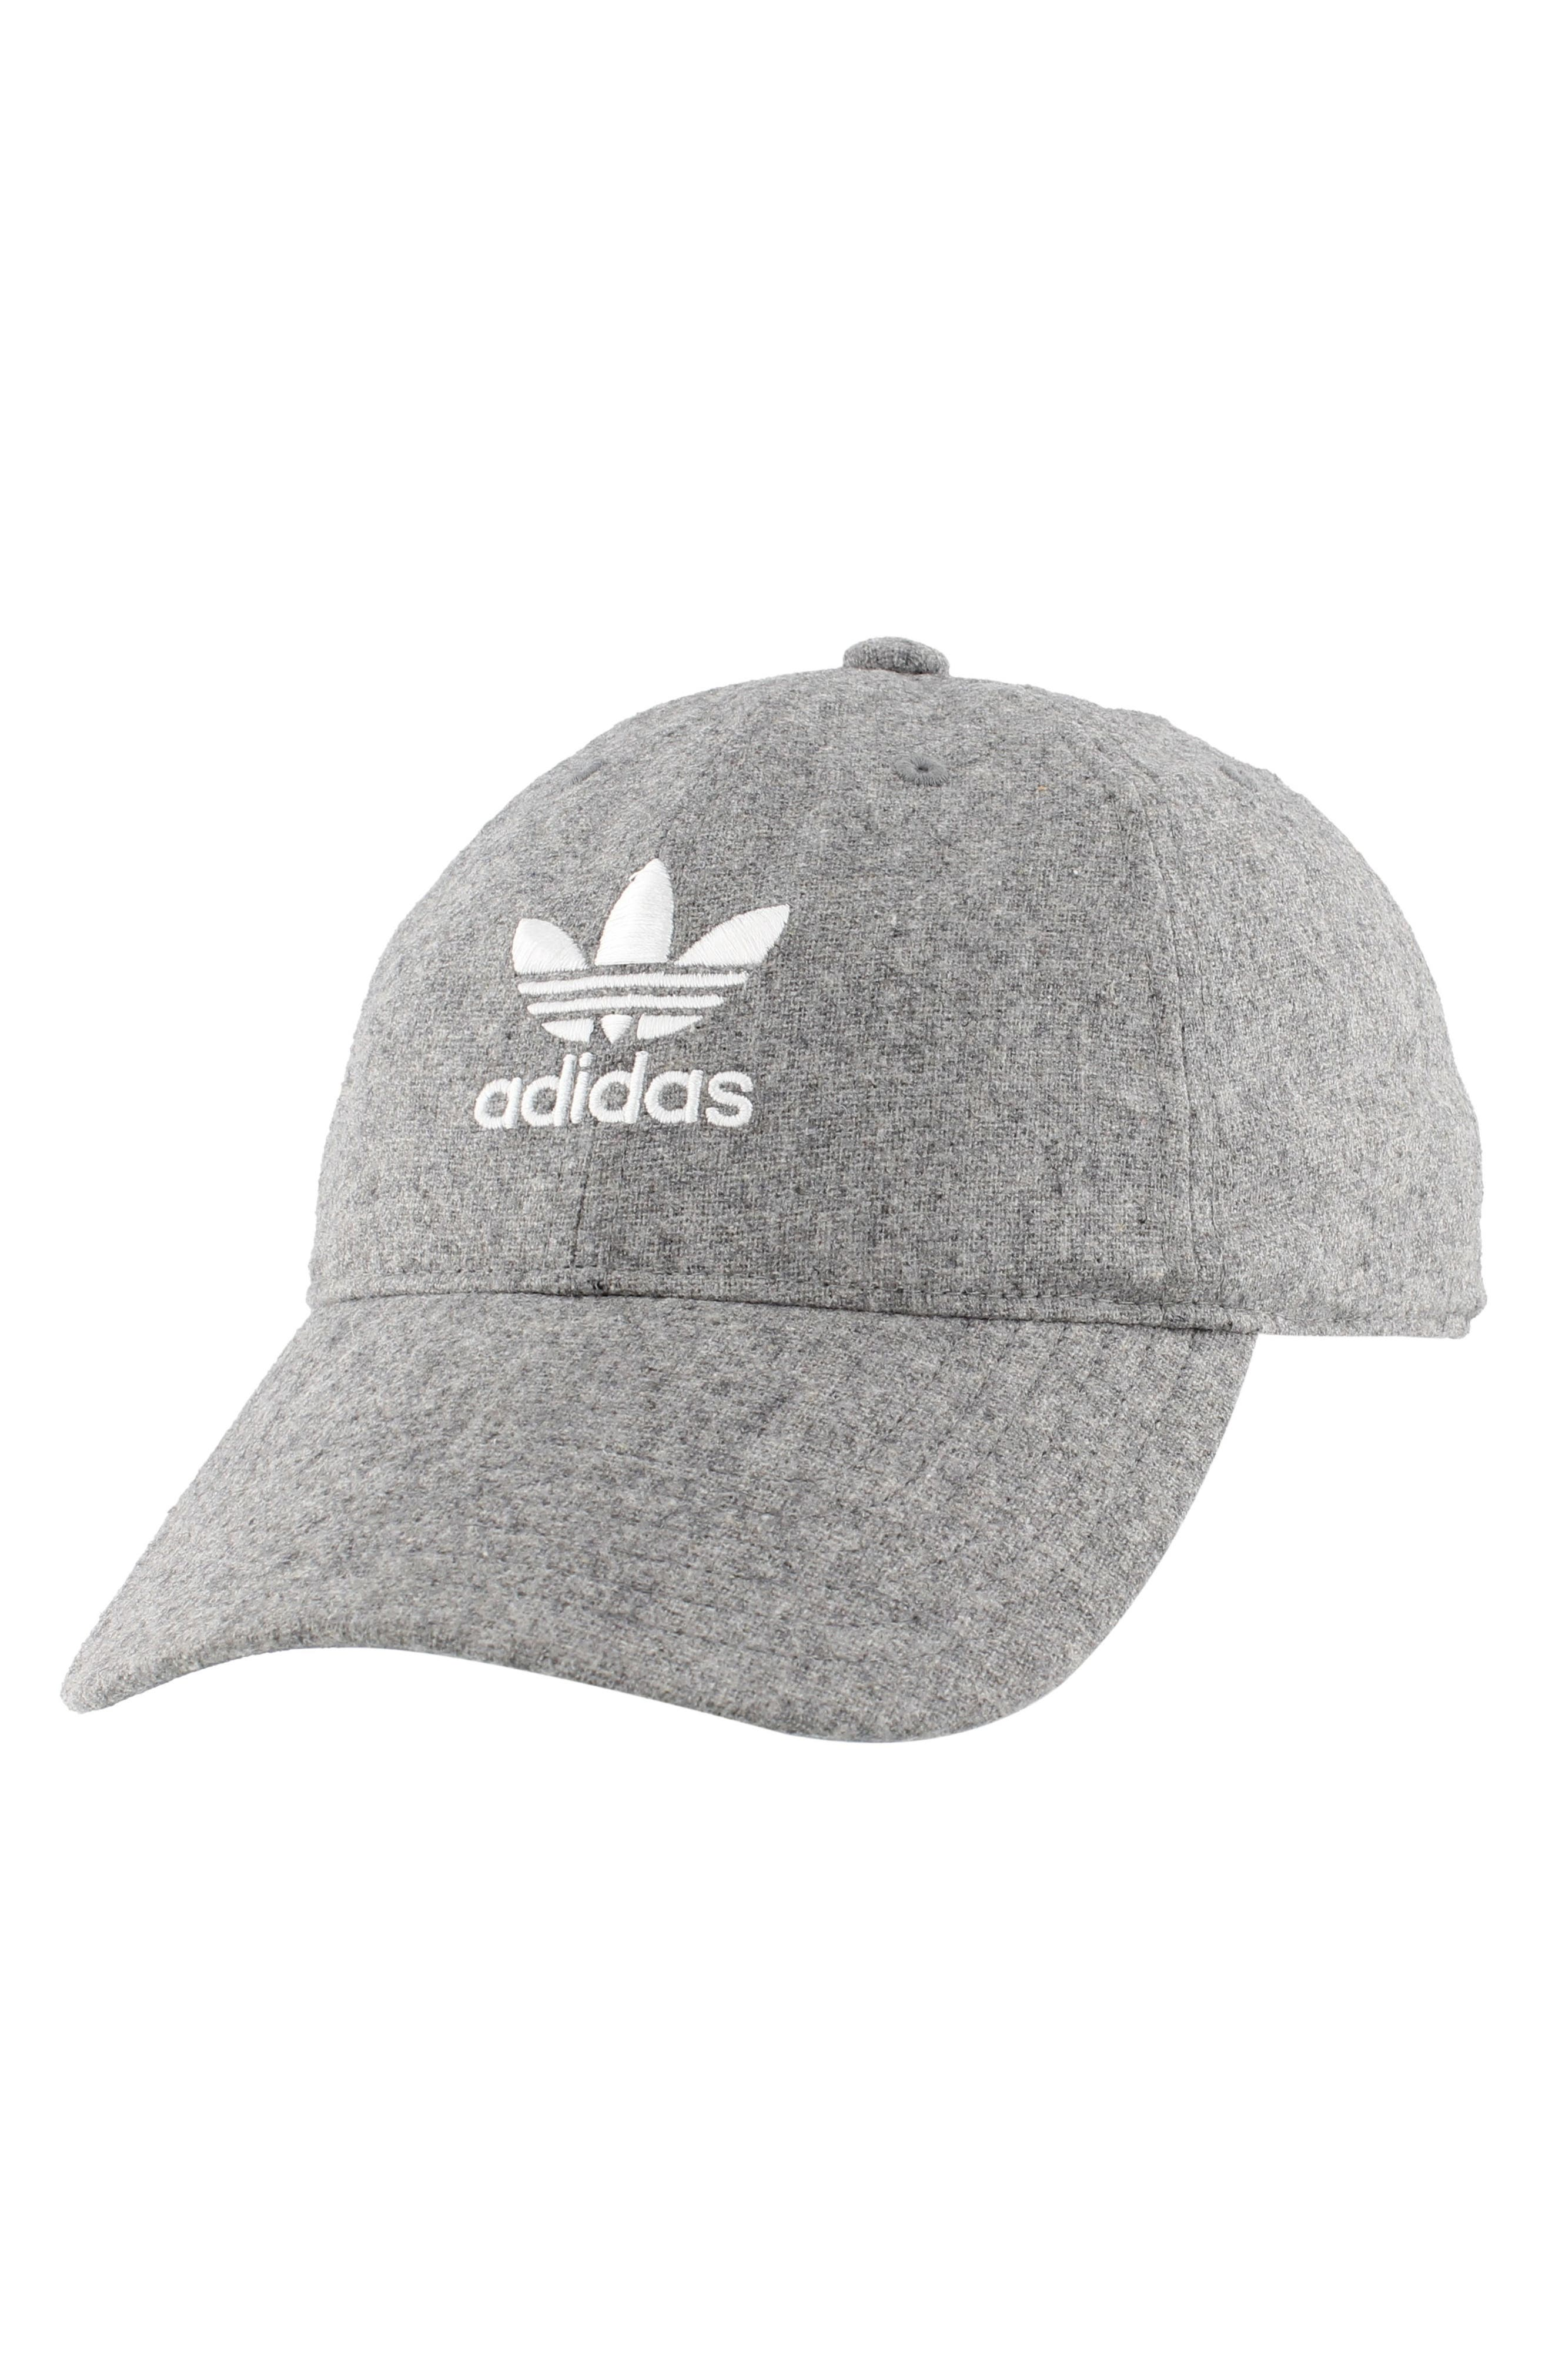 adidas Relaxed Plus Baseball Cap